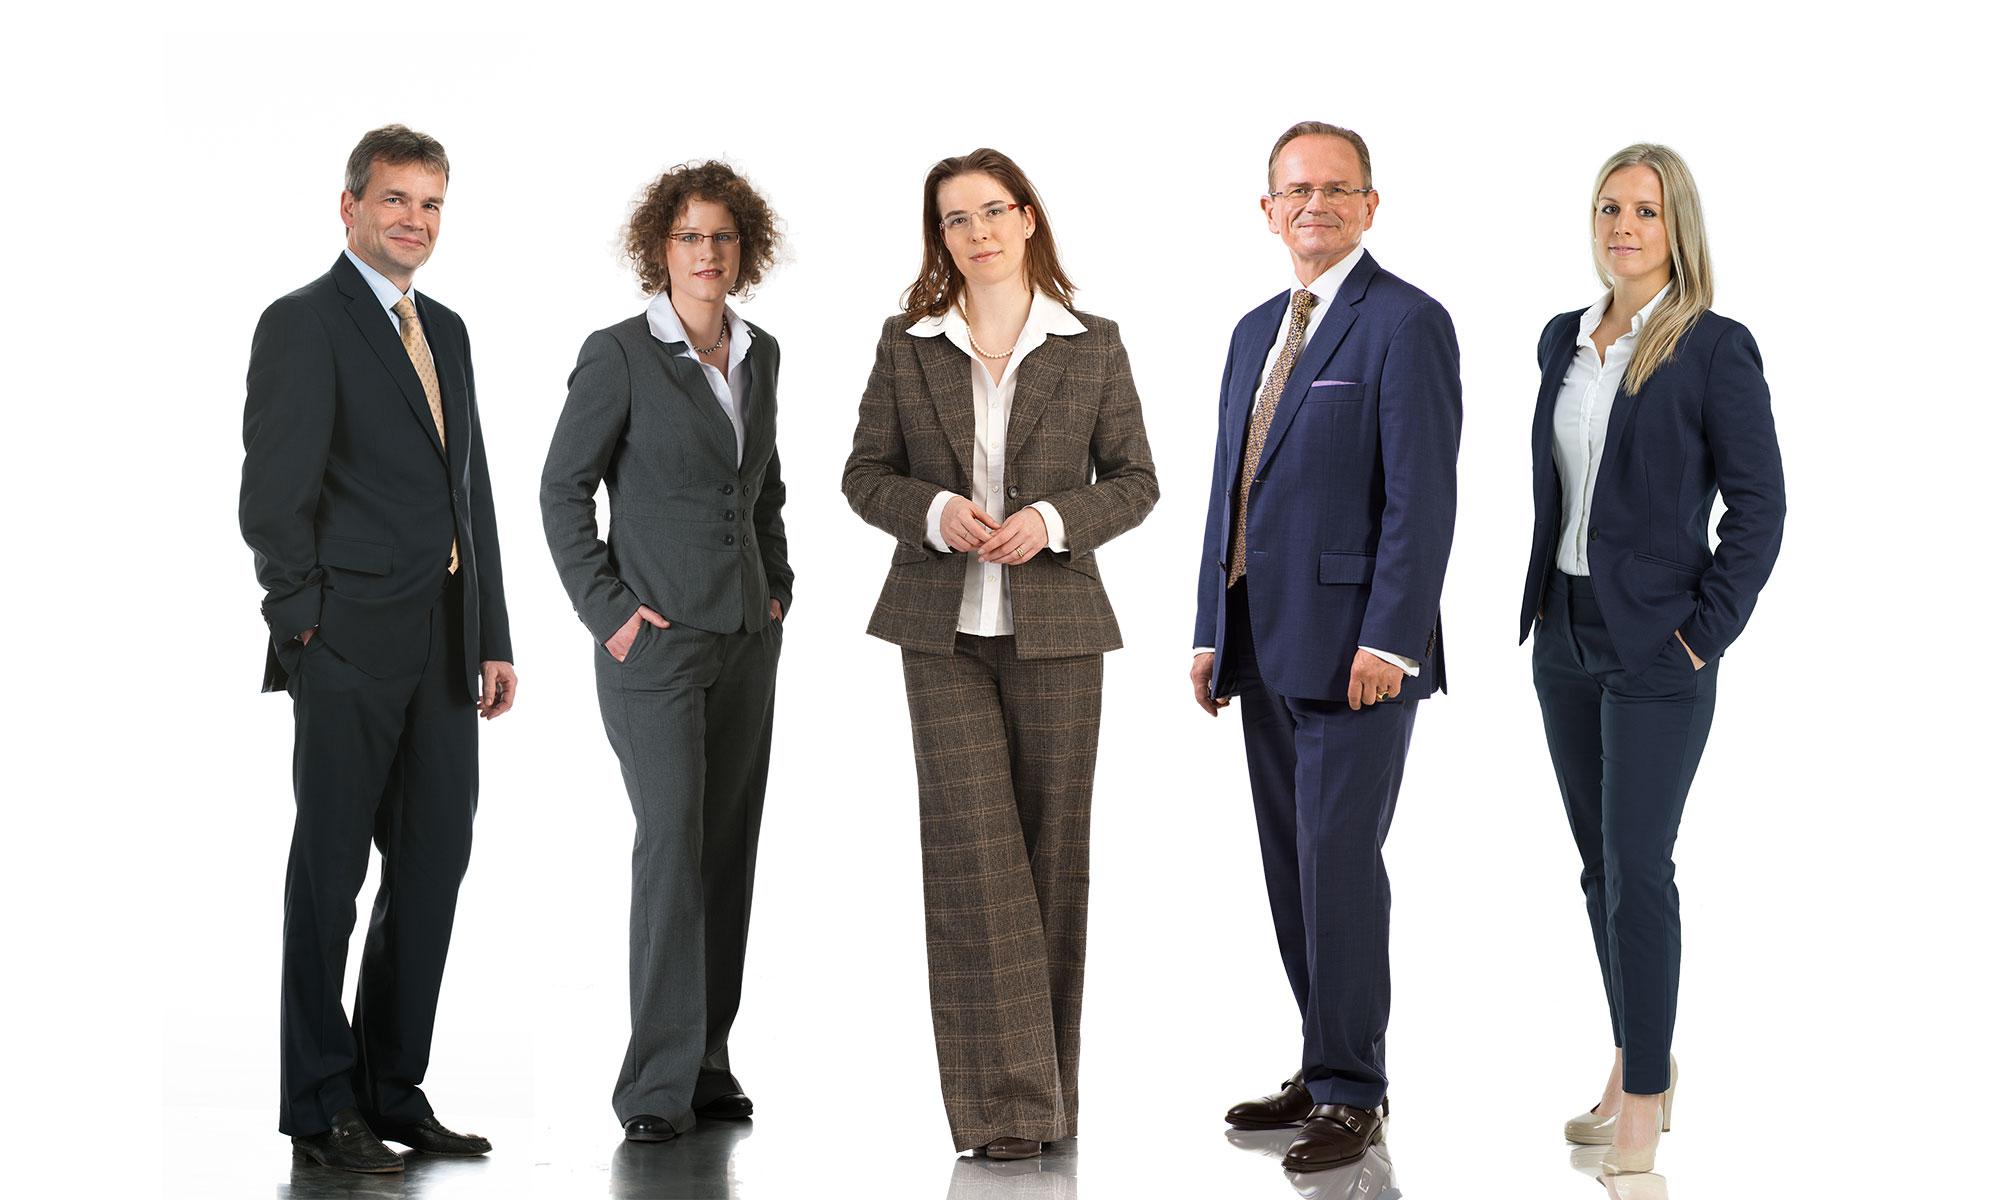 Rechtsanwälte Trier Seibel van Raay Bolinski Dymke Meyer Rechtsanwalt Rechtsanwältin